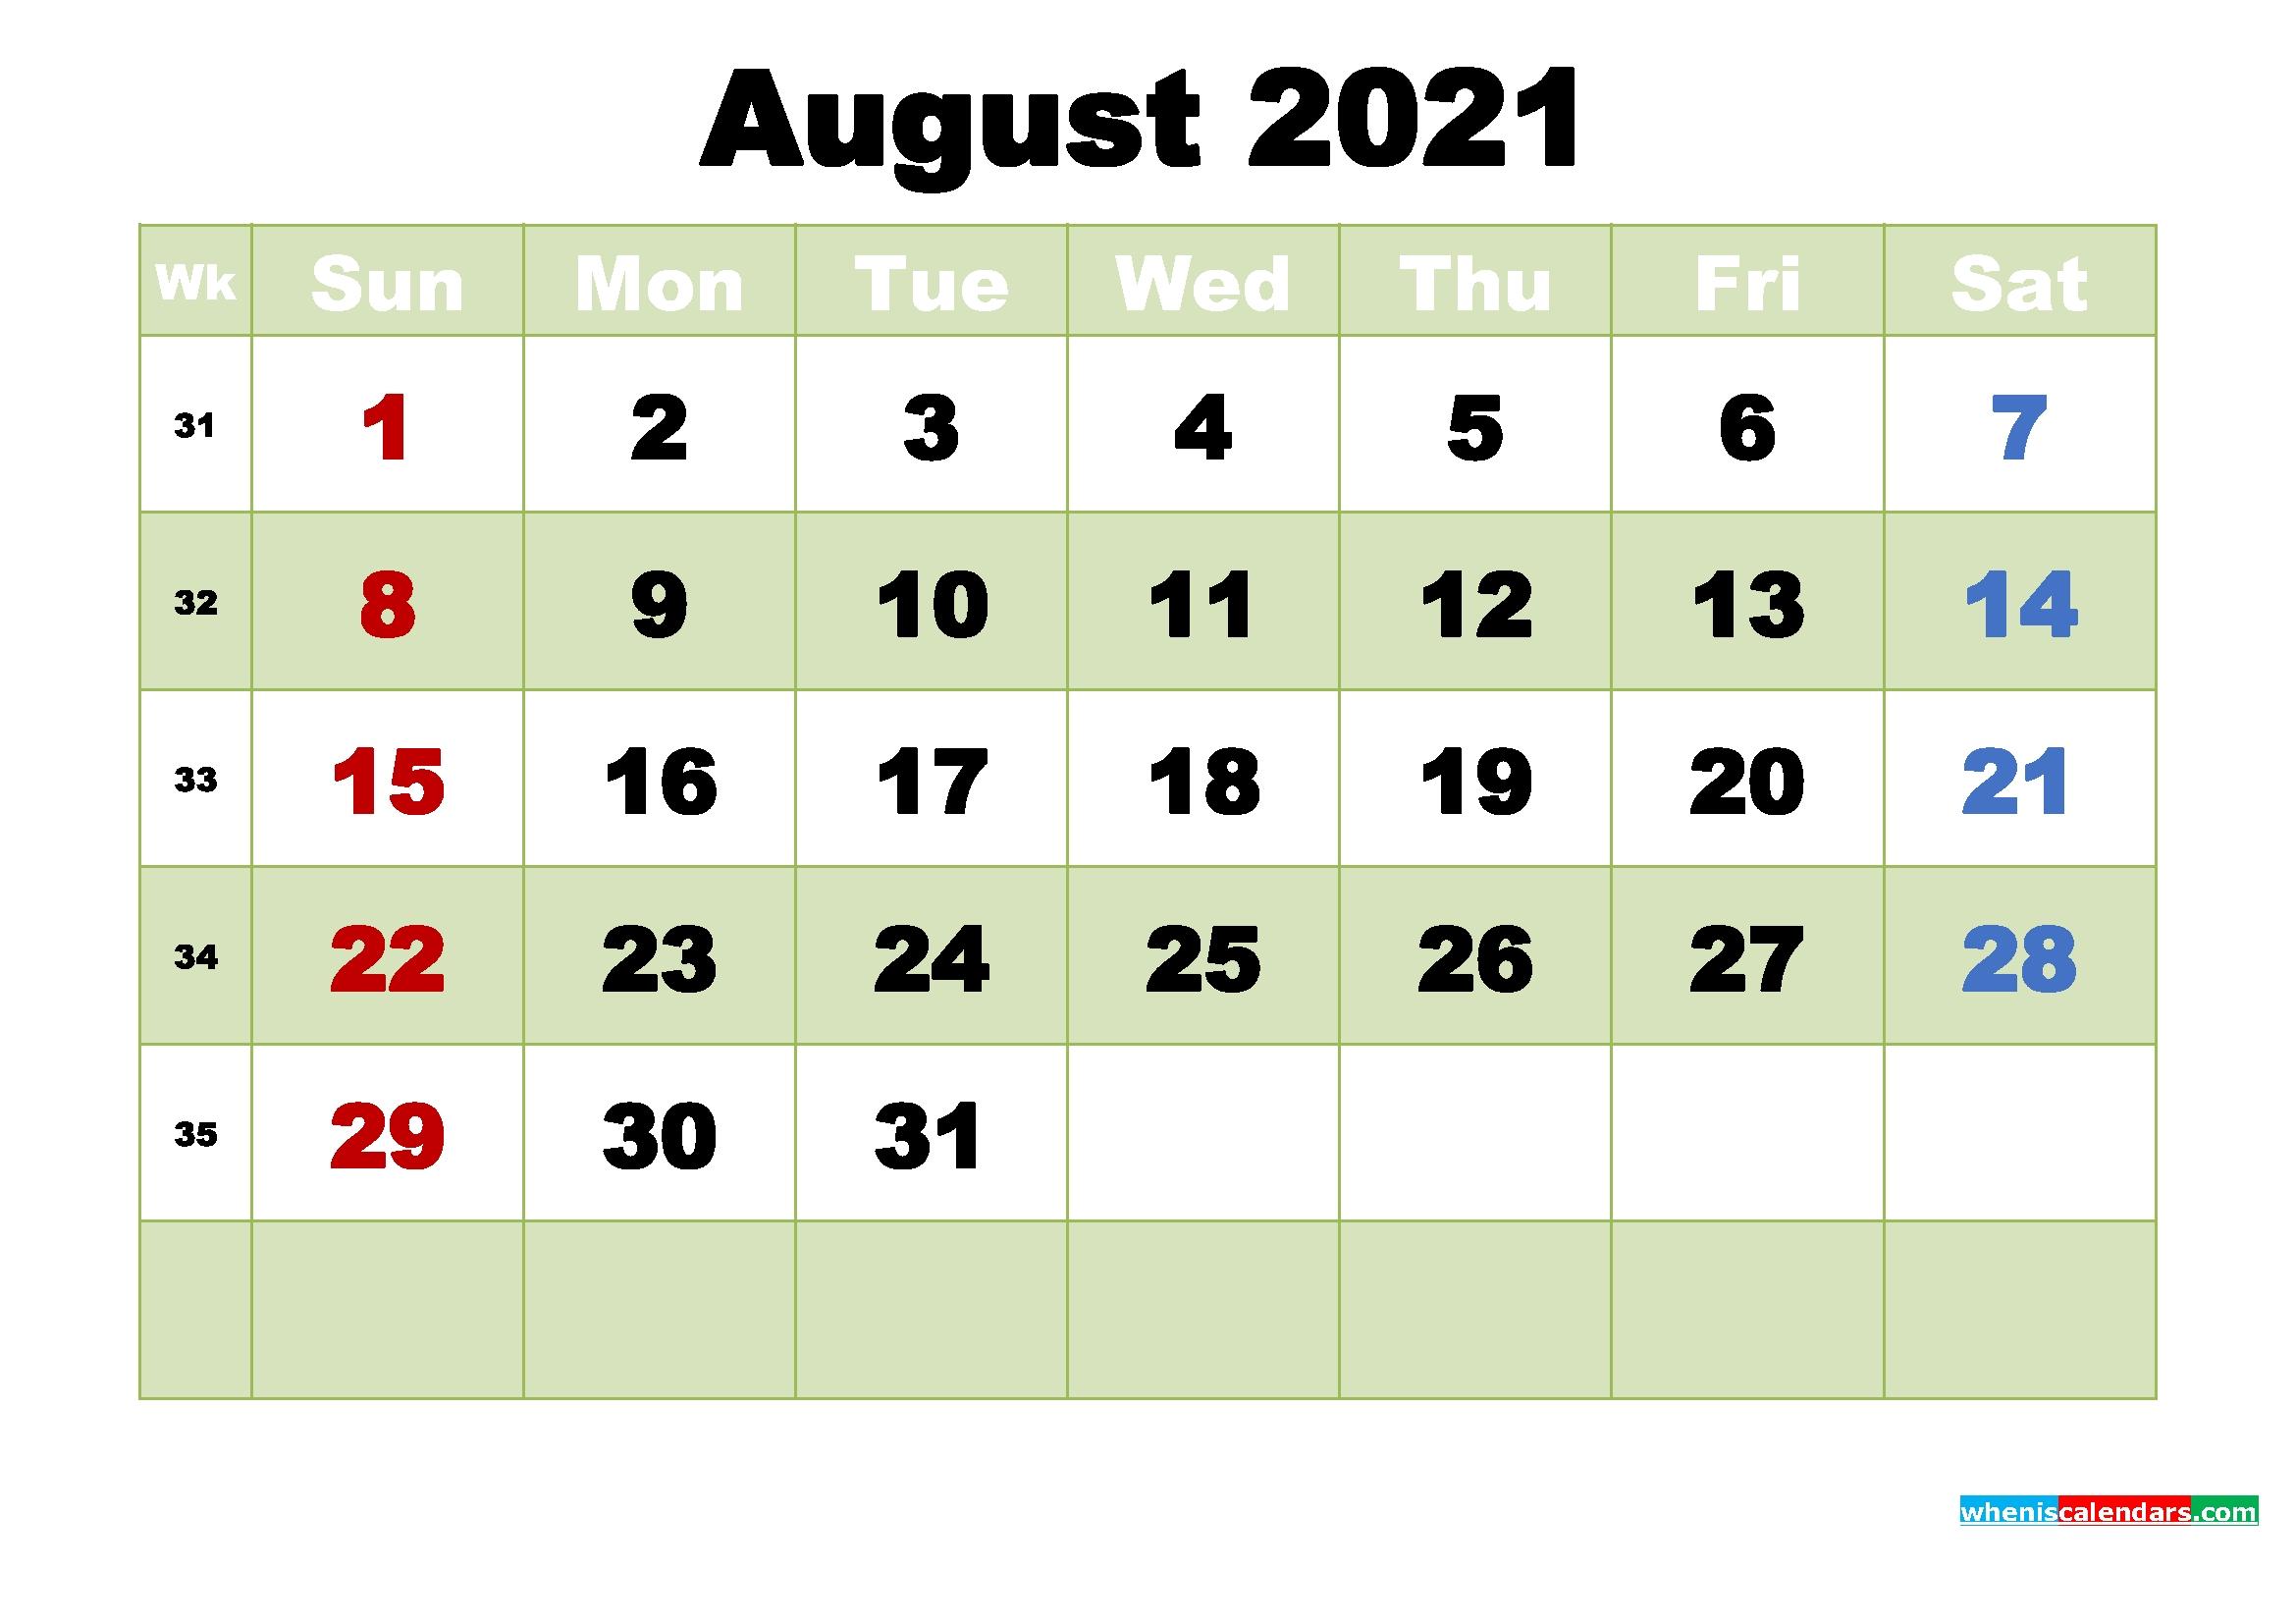 Free August 2021 Printable Calendar Template Word, Pdf | Free Printable 2020 Monthly Calendar August 2021 Calendar With Holidays Usa